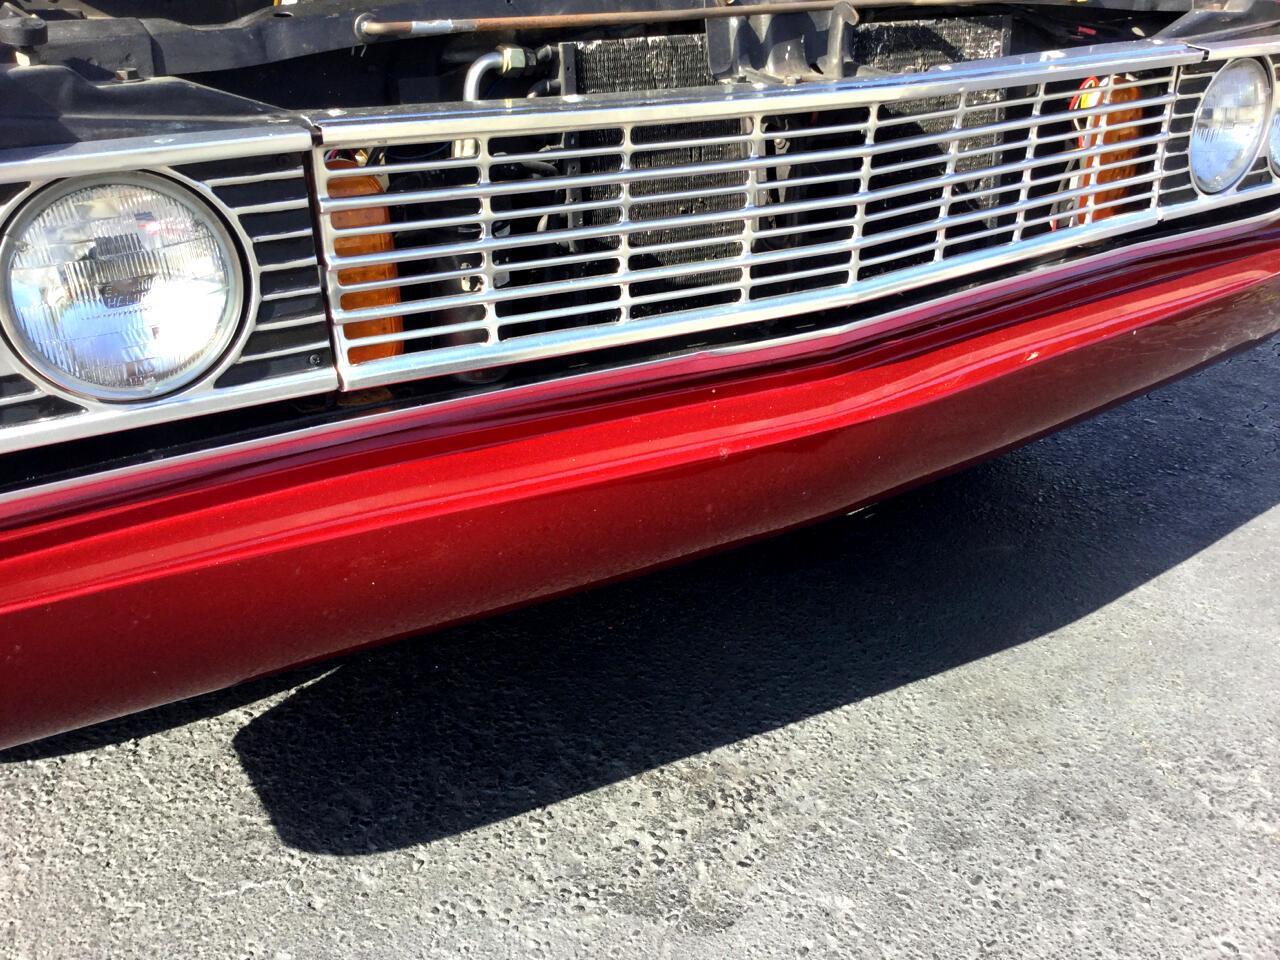 1964 Chevrolet El Camino (CC-1320776) for sale in Greenville, North Carolina